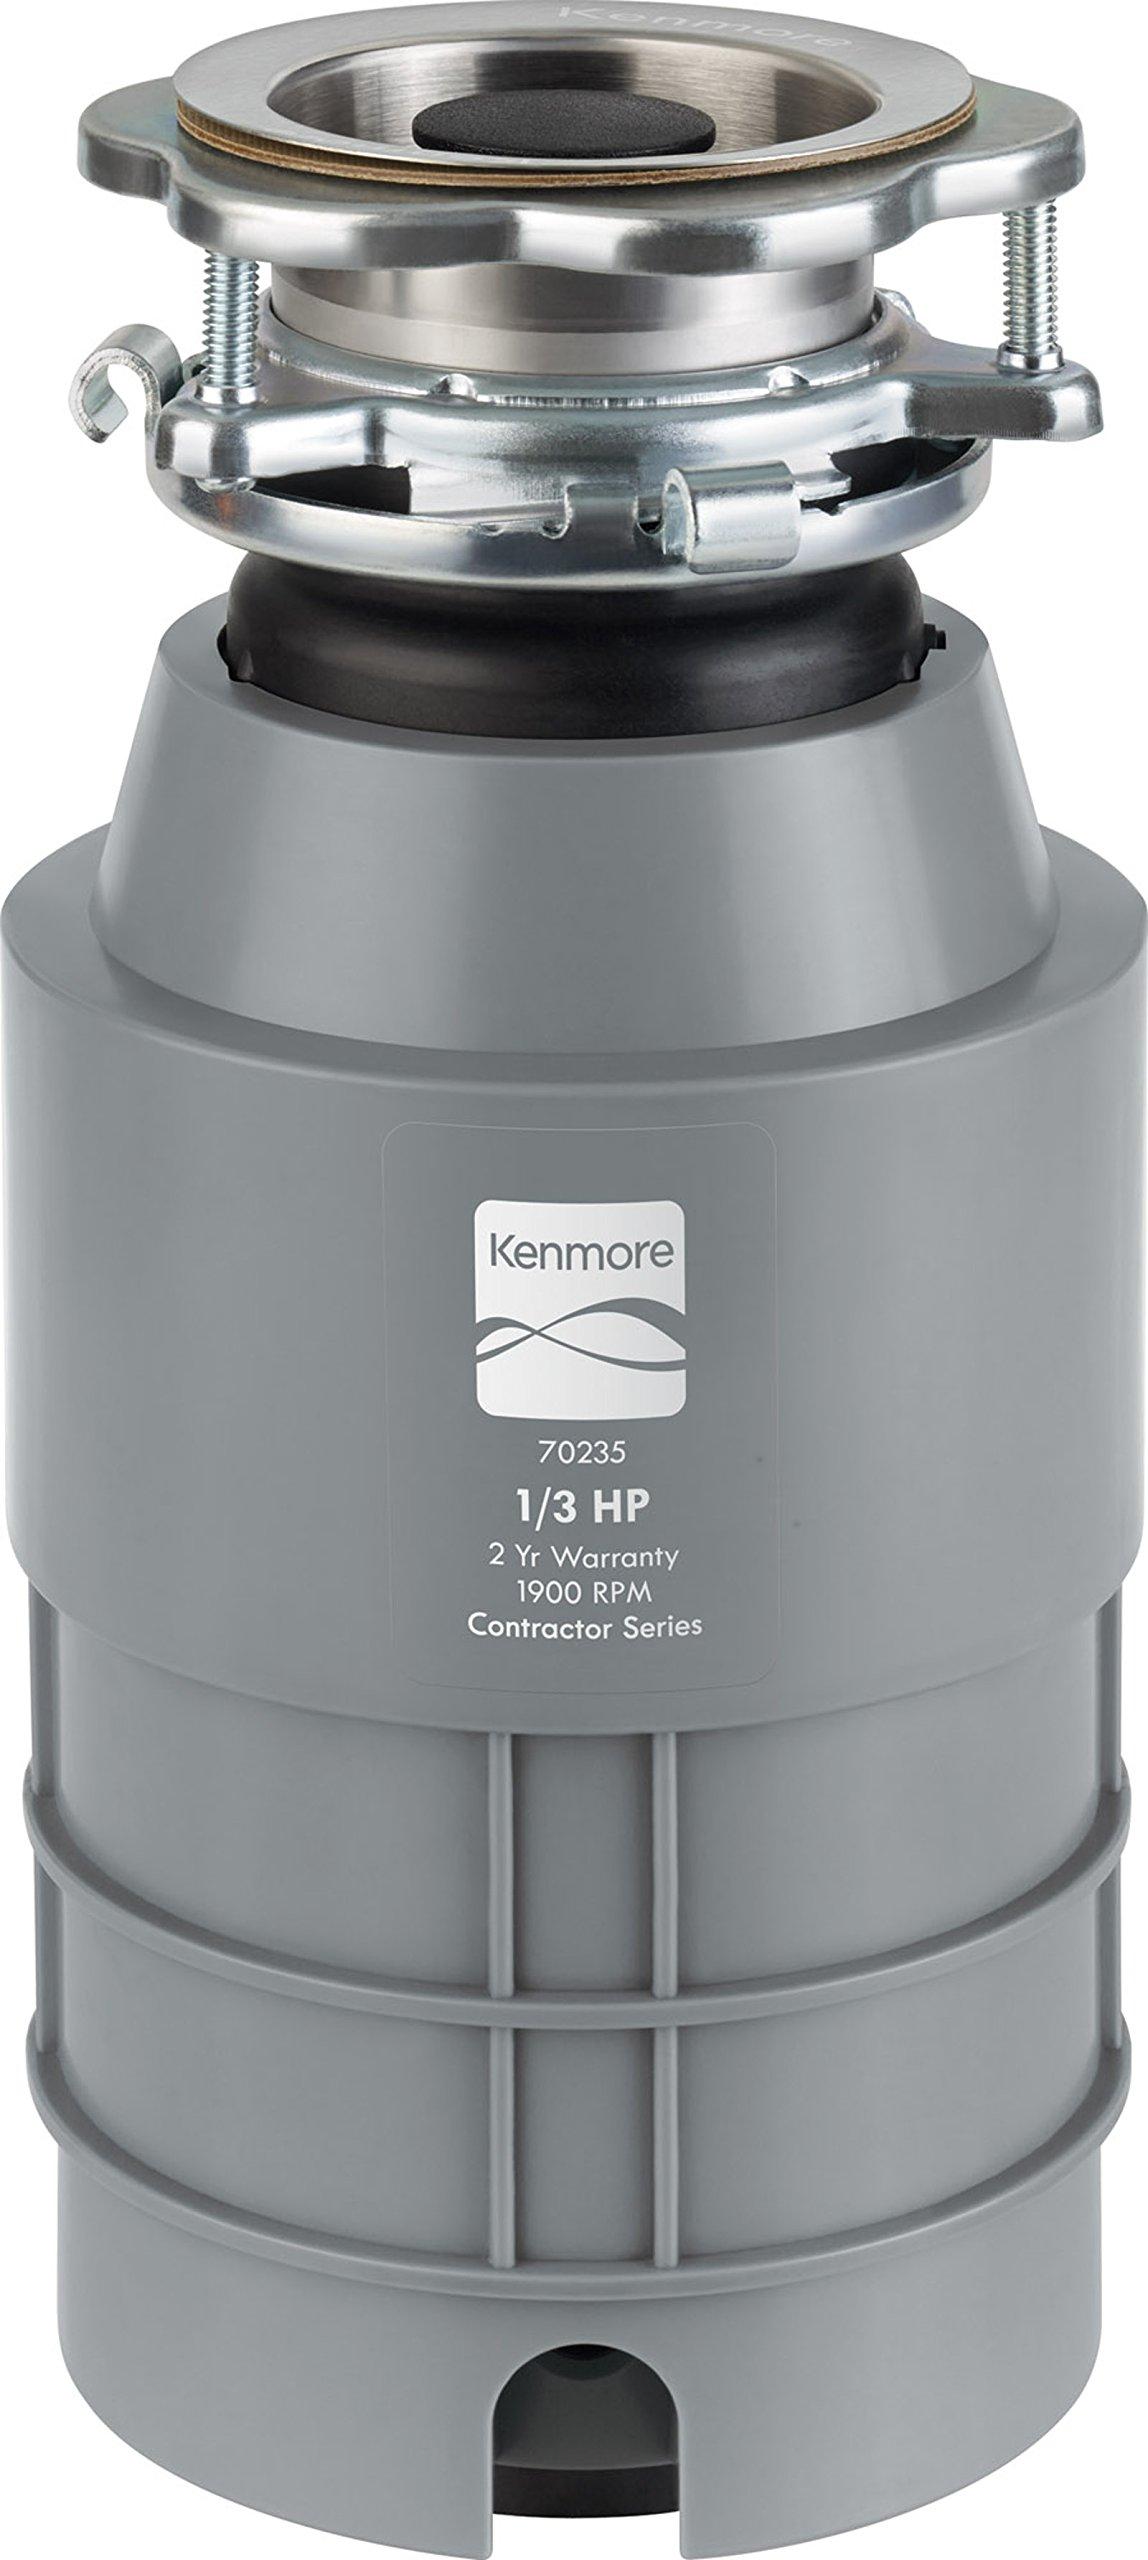 Kenmore 02270235 Disposer 1/3 Horsepower High Torque, Gray